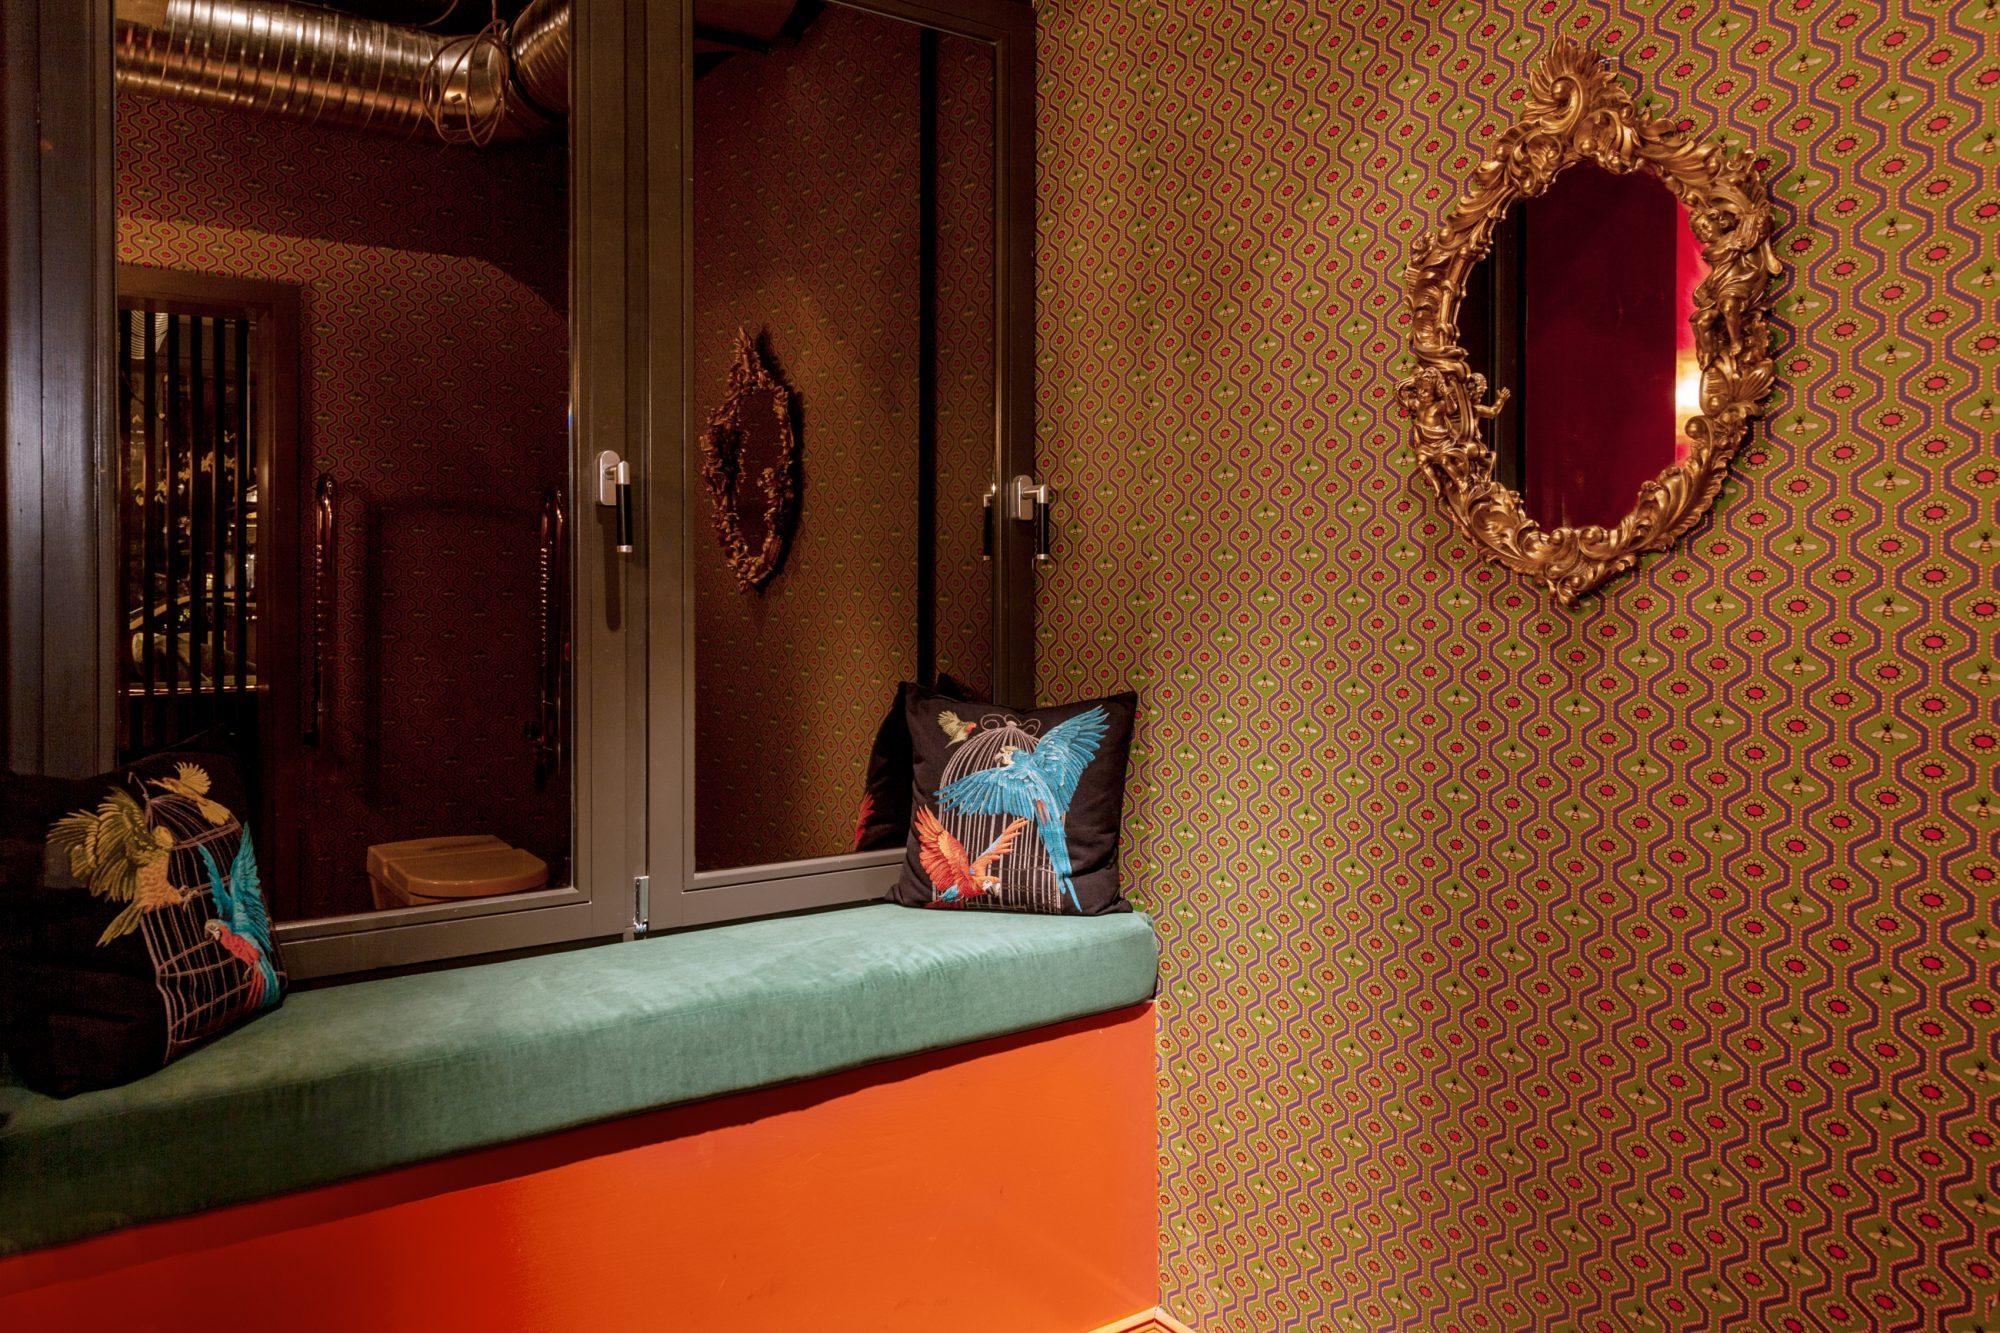 GUCCI Wallpaper alessandro michele lindholz interior design powder room wallpaper